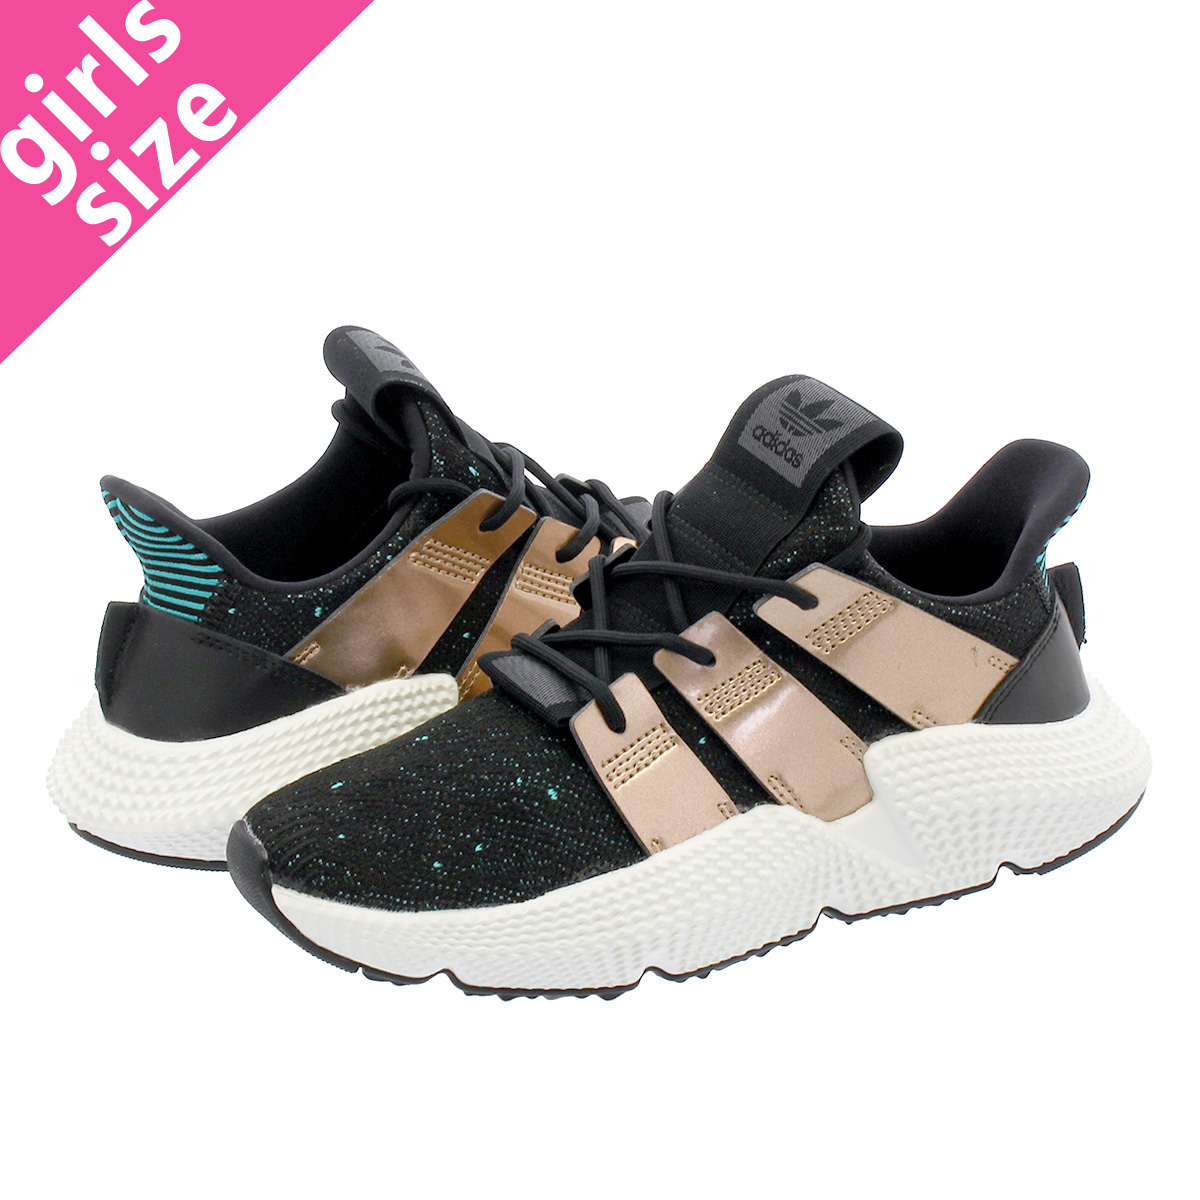 reputable site 2daf6 24151 adidas PROPHERE W Adidas pro Fear W CORE BLACKLIGHT COPPER METHI-RES AQUA